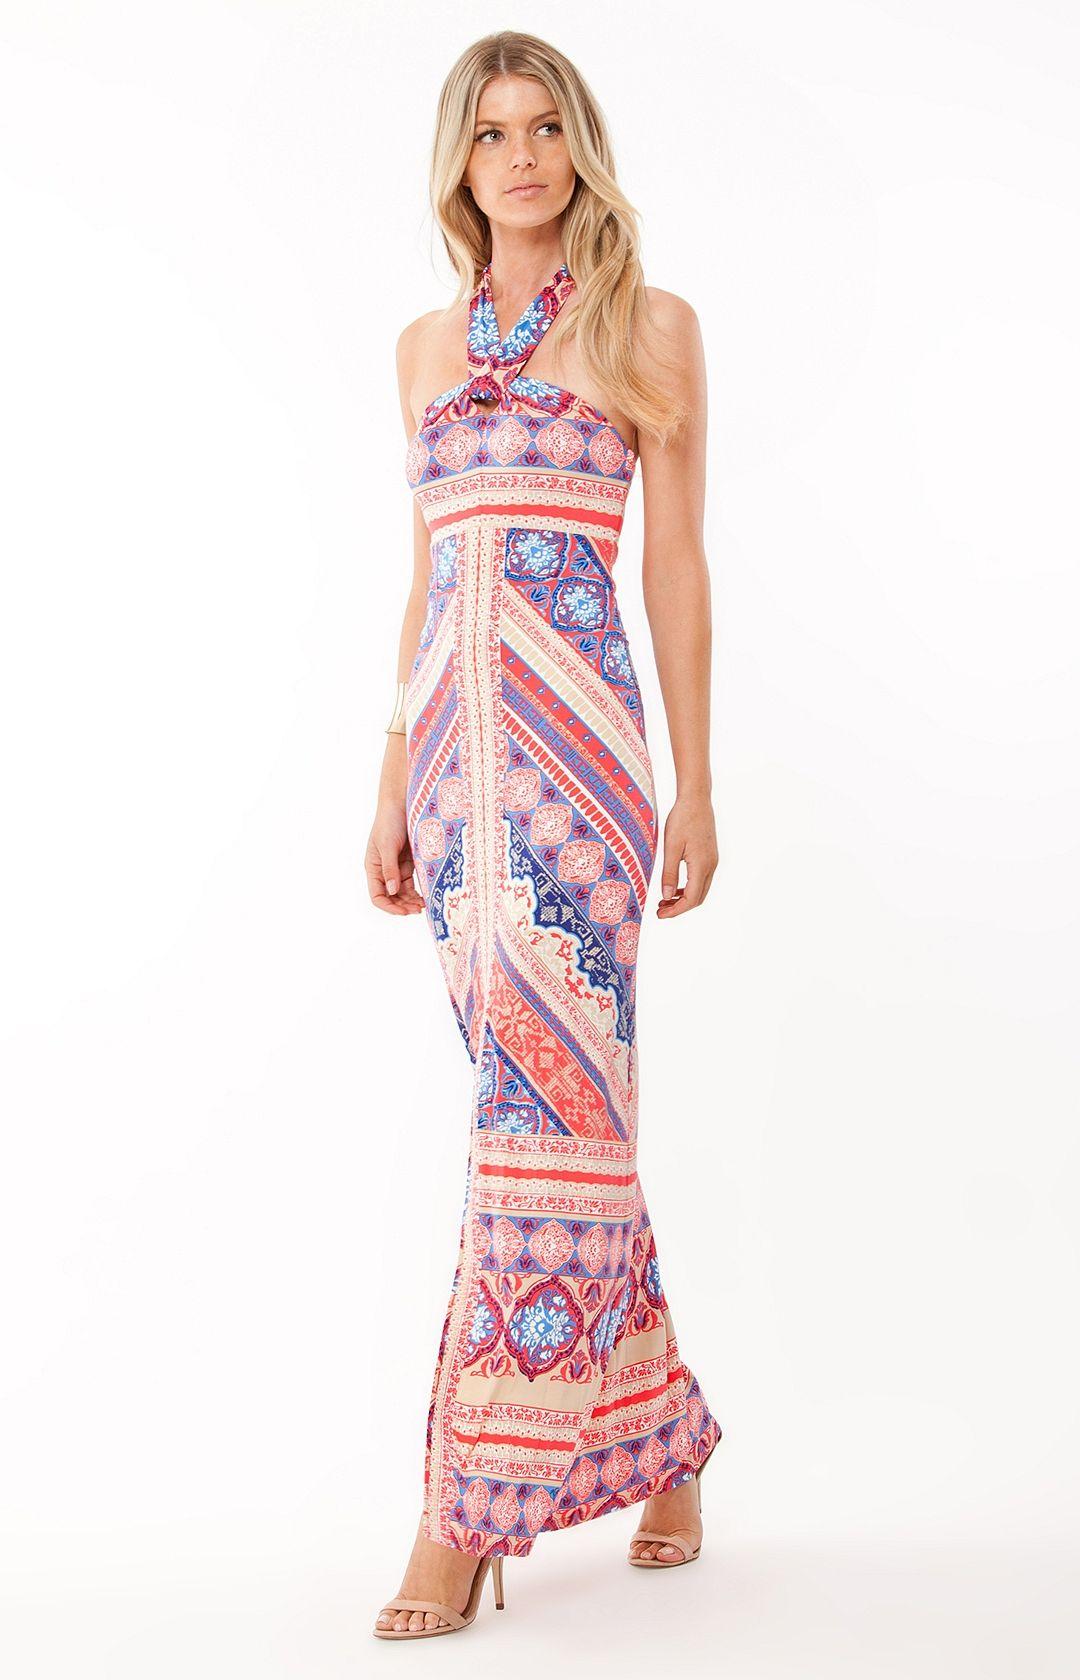 8f31101052 Neylan Halter Maxi   Fashionista   Halter maxi dresses, Dresses ...